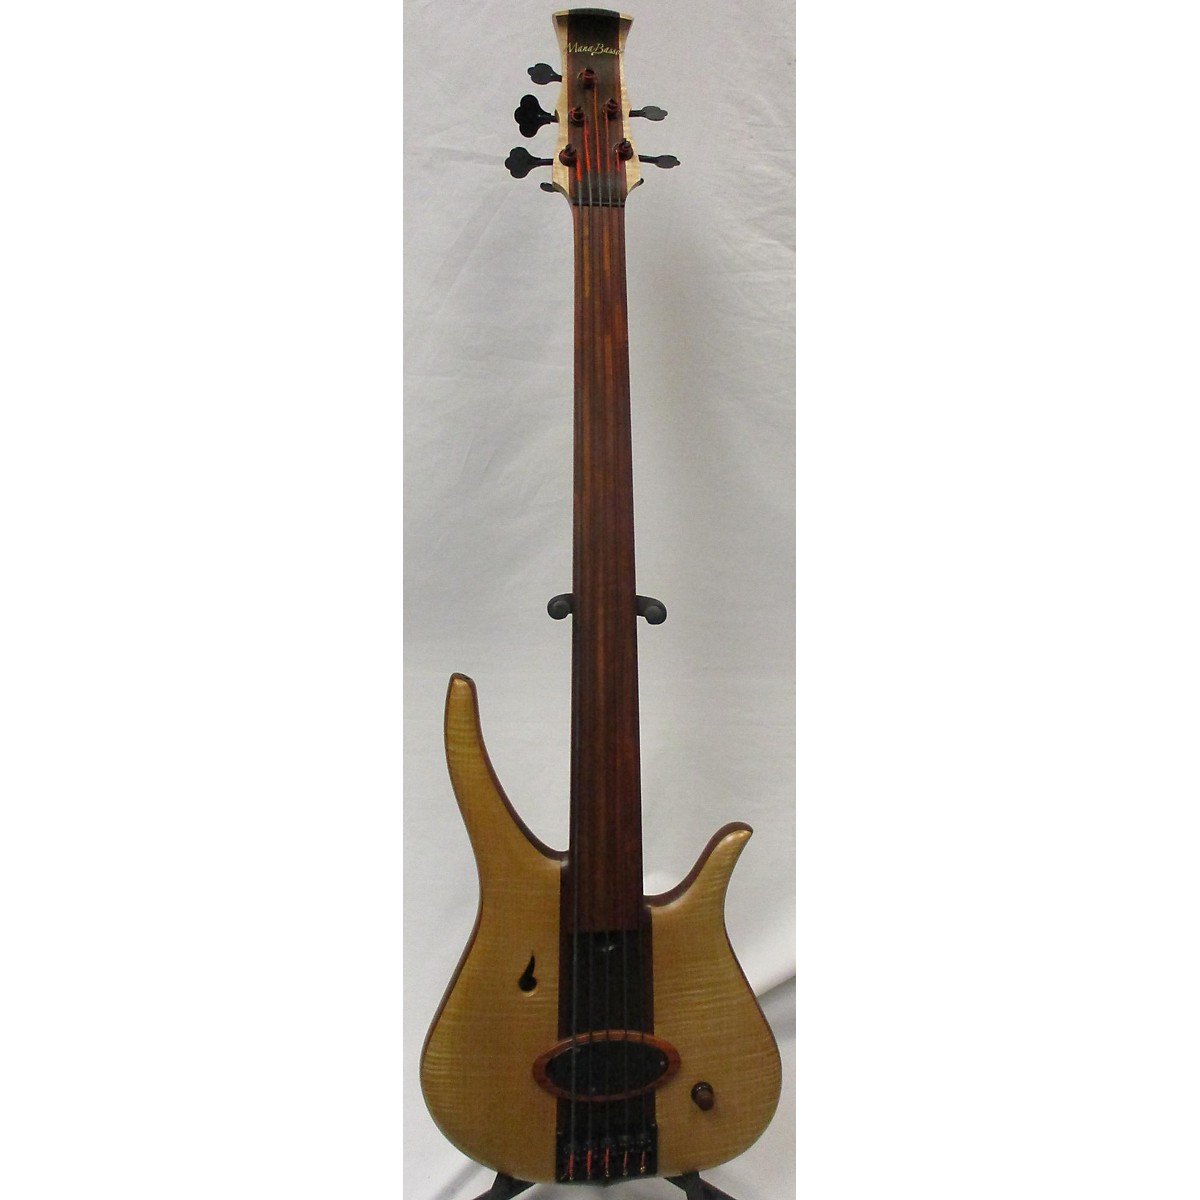 In Store Used Used 2018 Mana Basso La Laberta 1 Semi-Hollow Fretless Natural Electric Bass Guitar